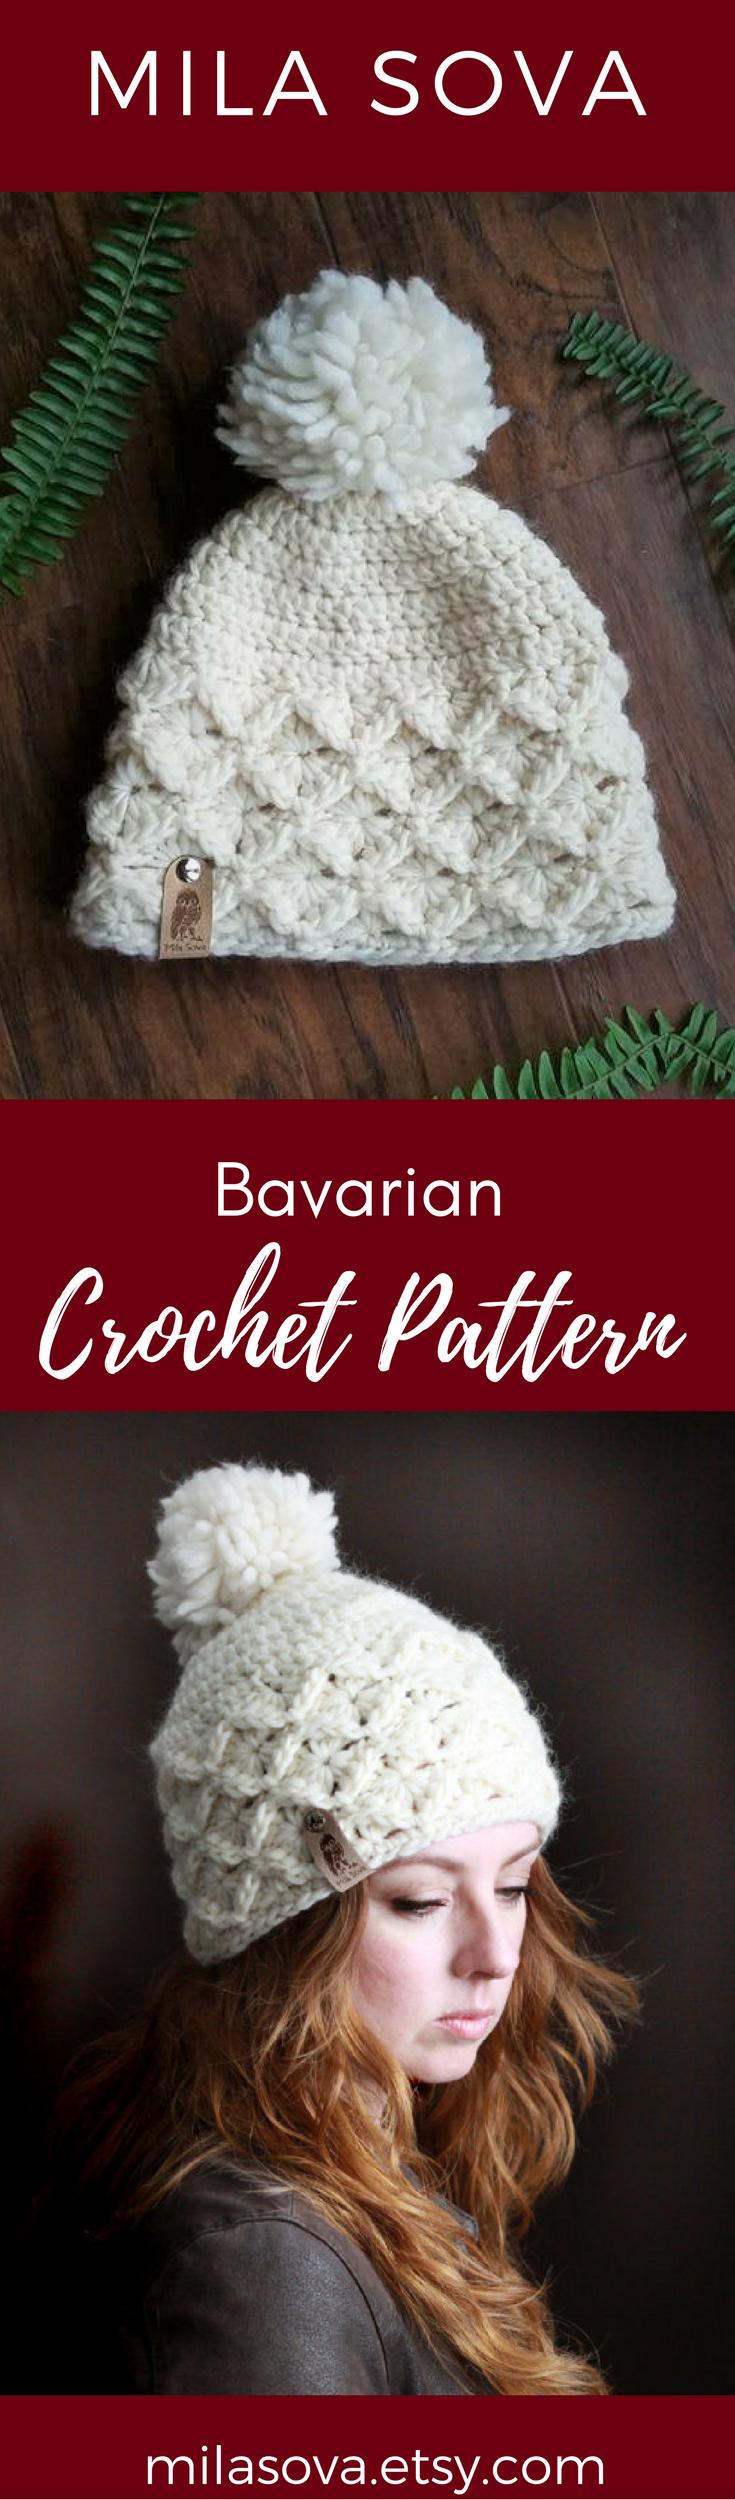 Nº170 Chunky Bavarian Beanie - Crochet PATTERN | Bavarian crochet ...